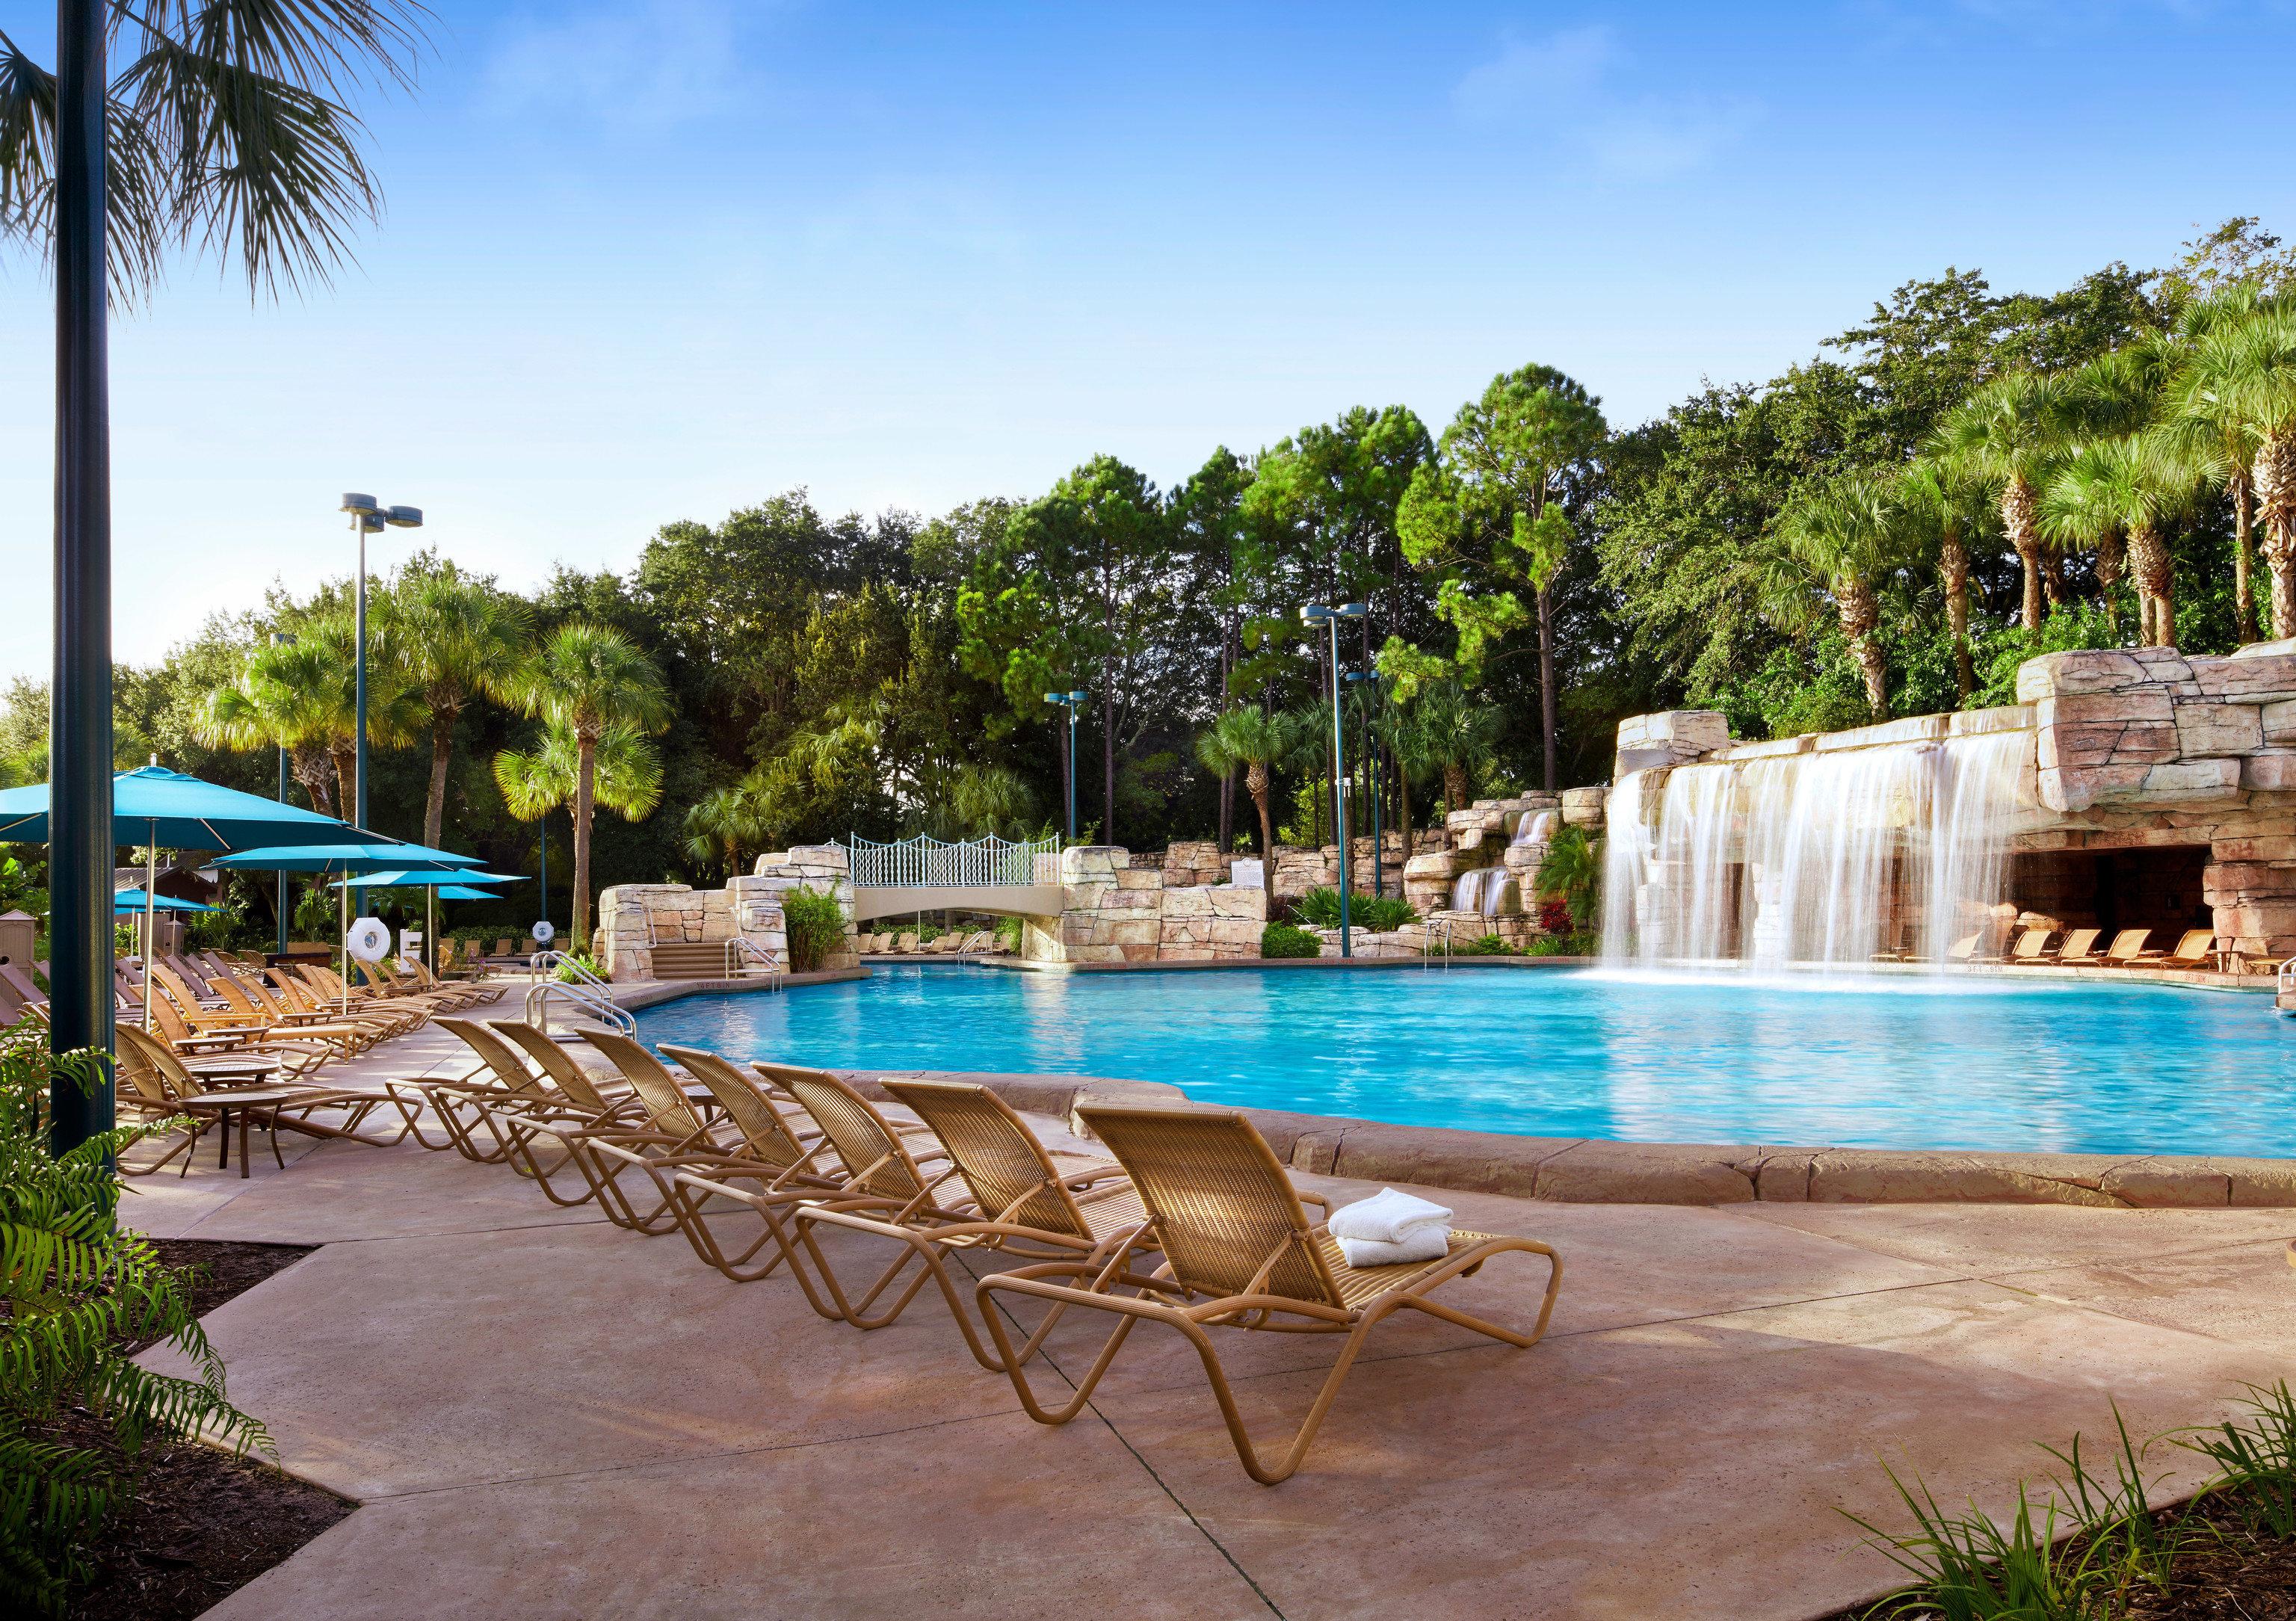 tree sky ground leisure swimming pool property Pool Resort palm Villa lawn Beach backyard caribbean hacienda condominium Lagoon lined Deck swimming sandy shade shore